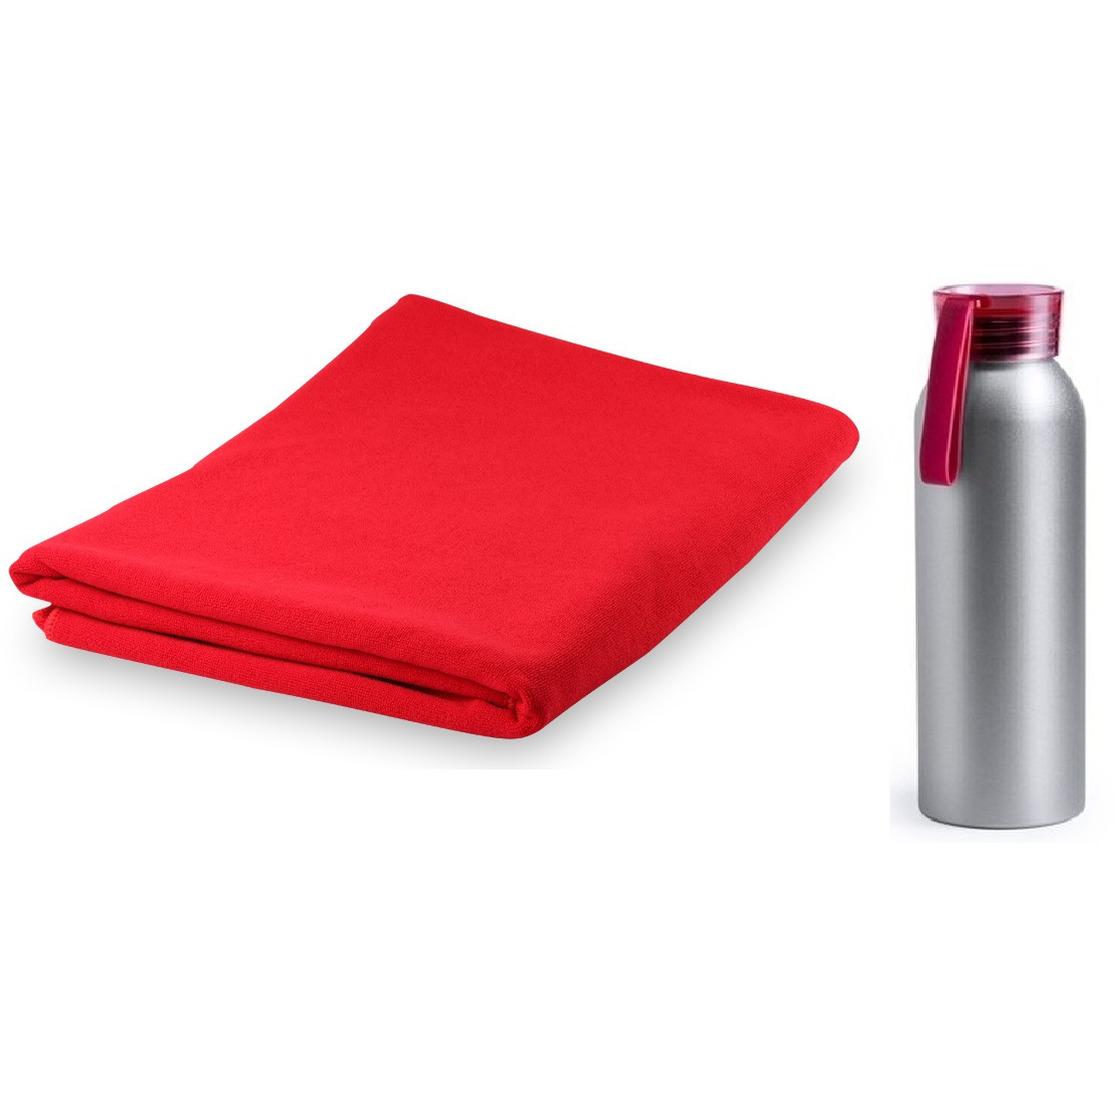 Yoga fitness set rode handdoek extra absorberend en bidon drinkfles